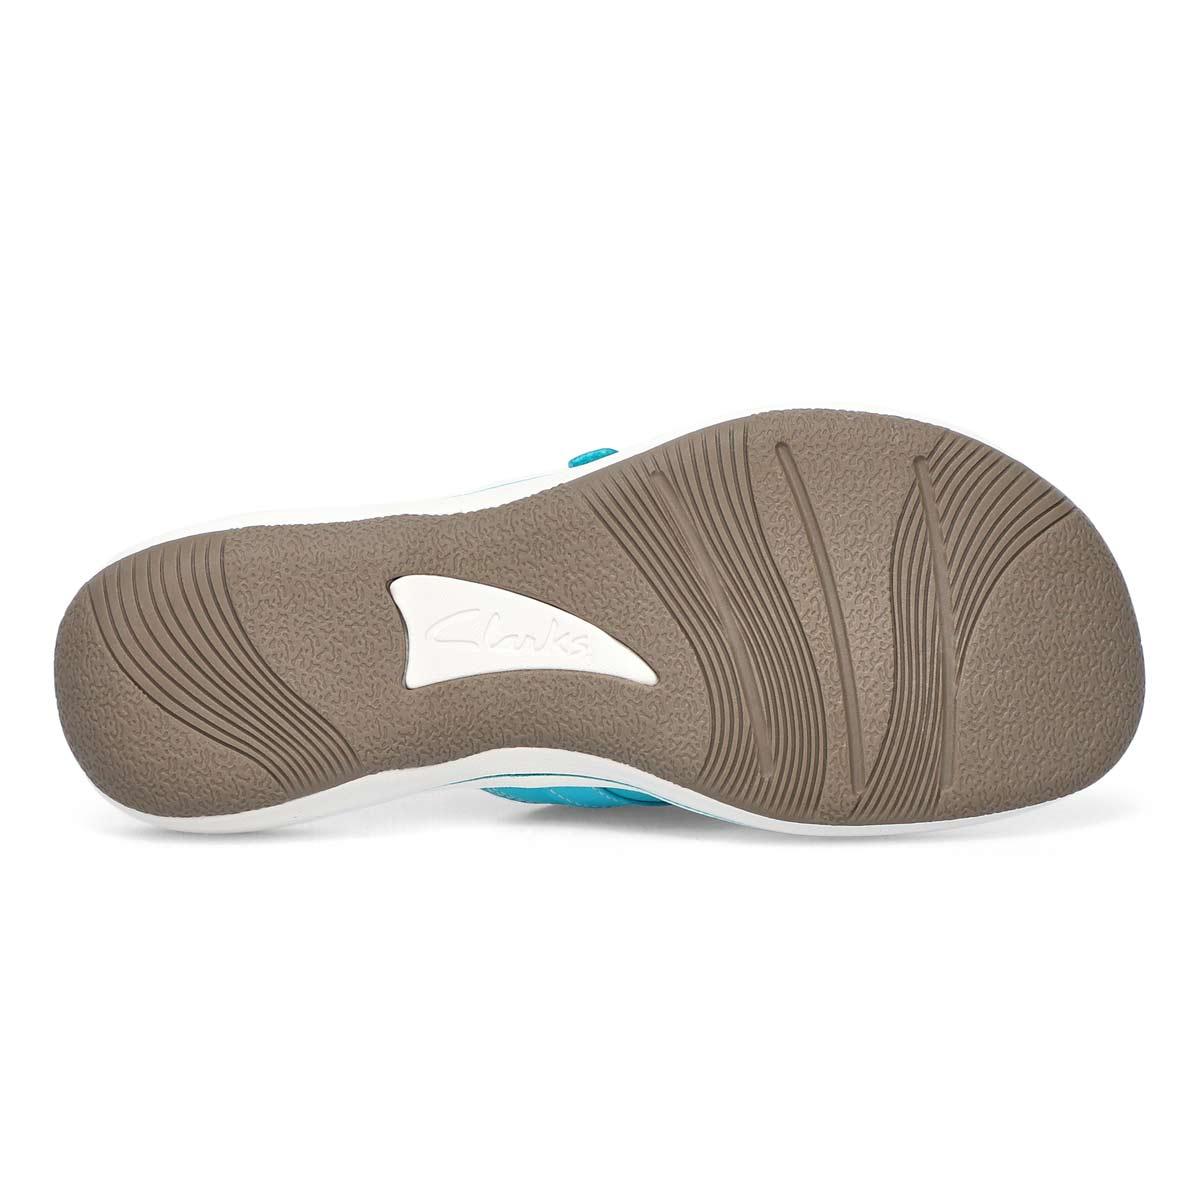 Sandale tong Breeze Sea, aqua femme